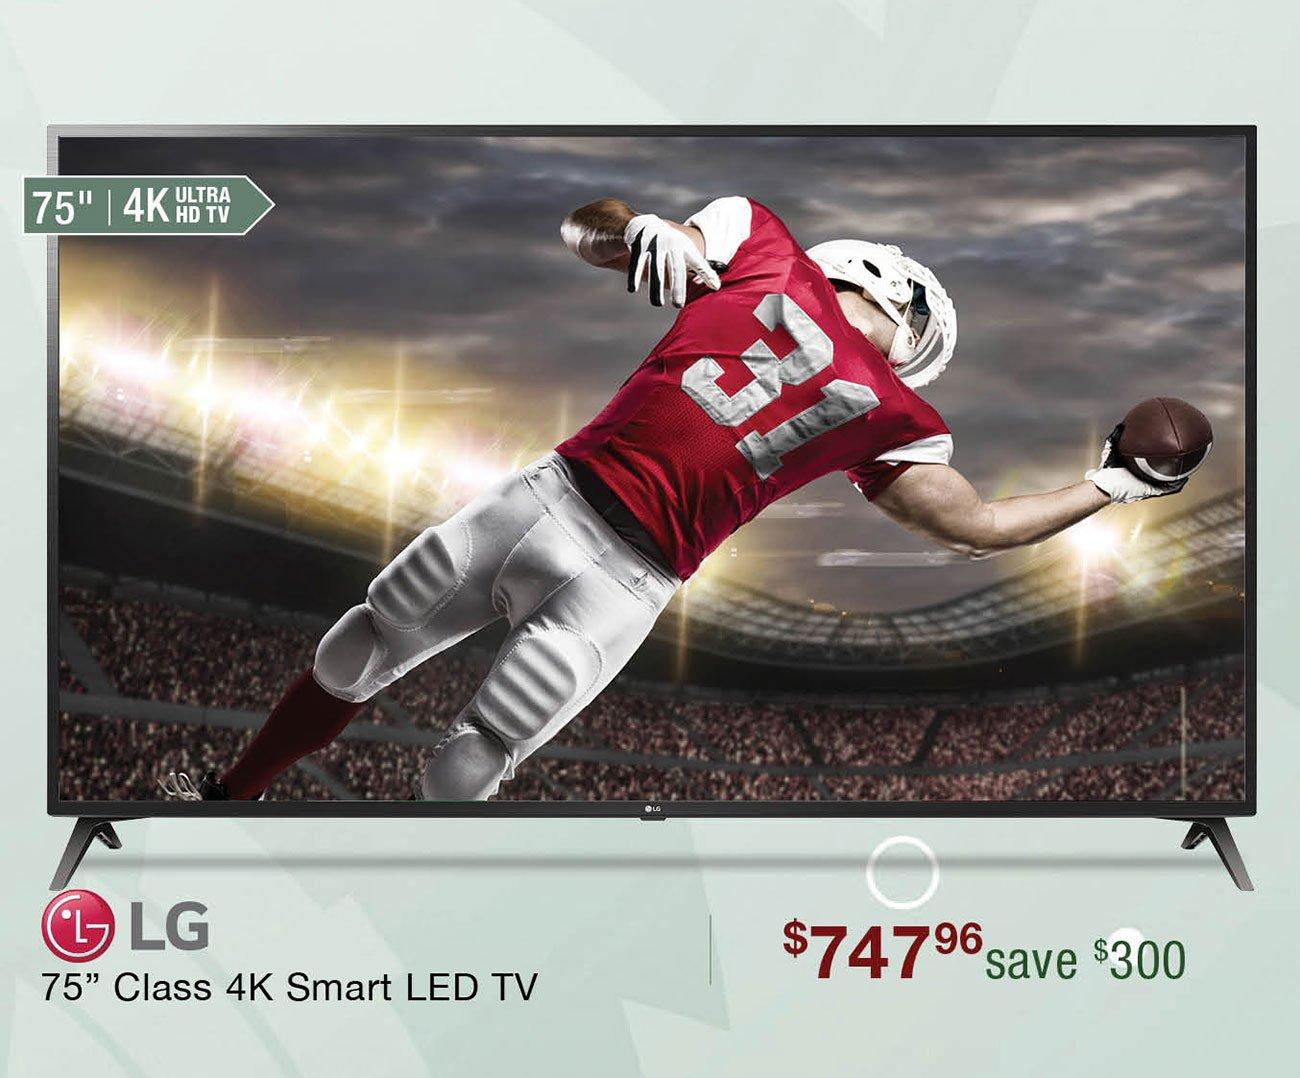 Lg-75-inch-4k-tv